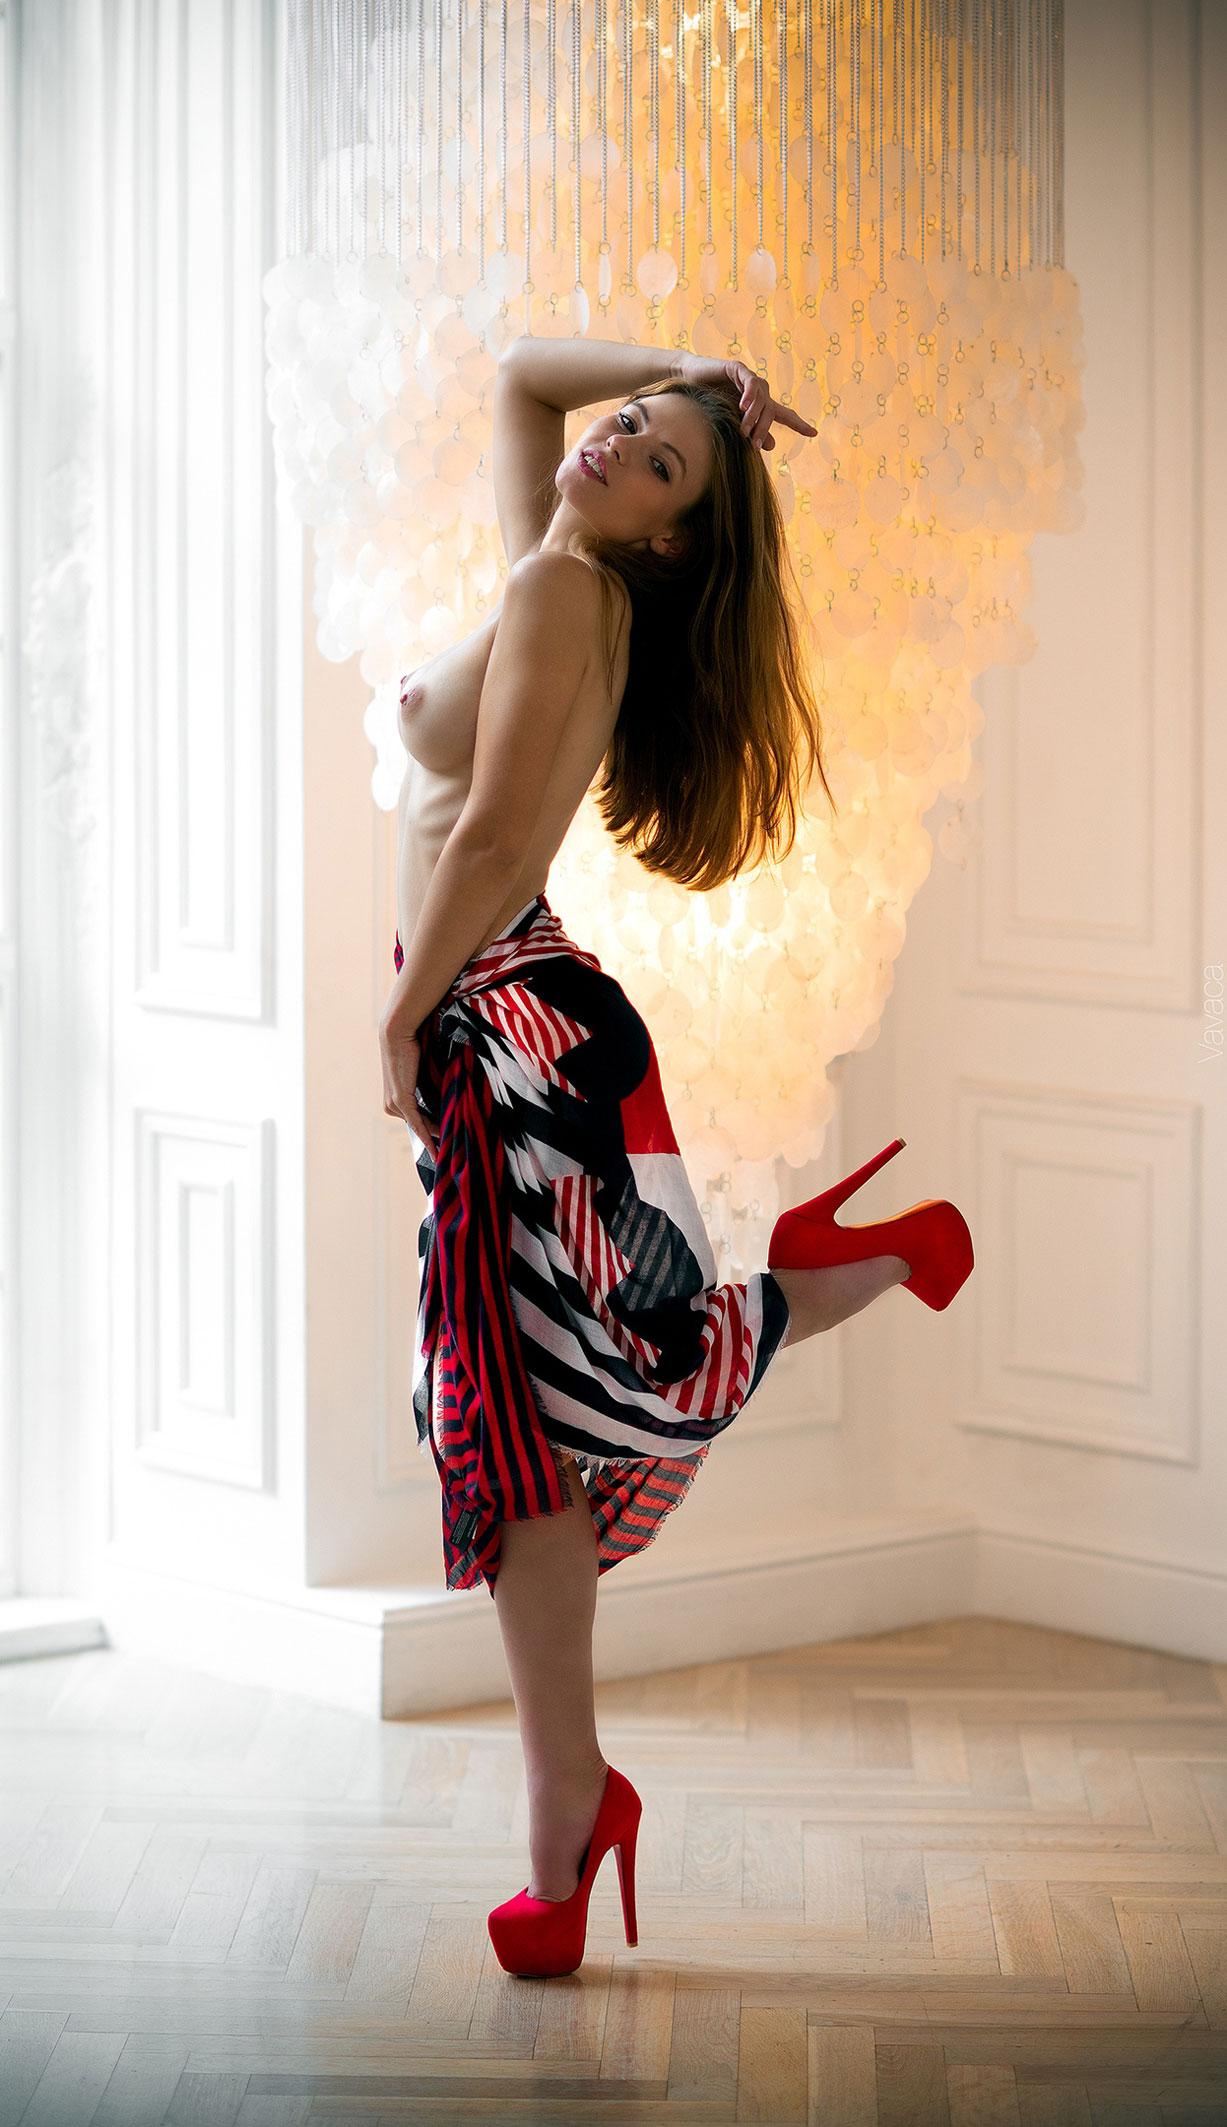 Viktoria Aliko - Vladimir Nikolaev photoshoot